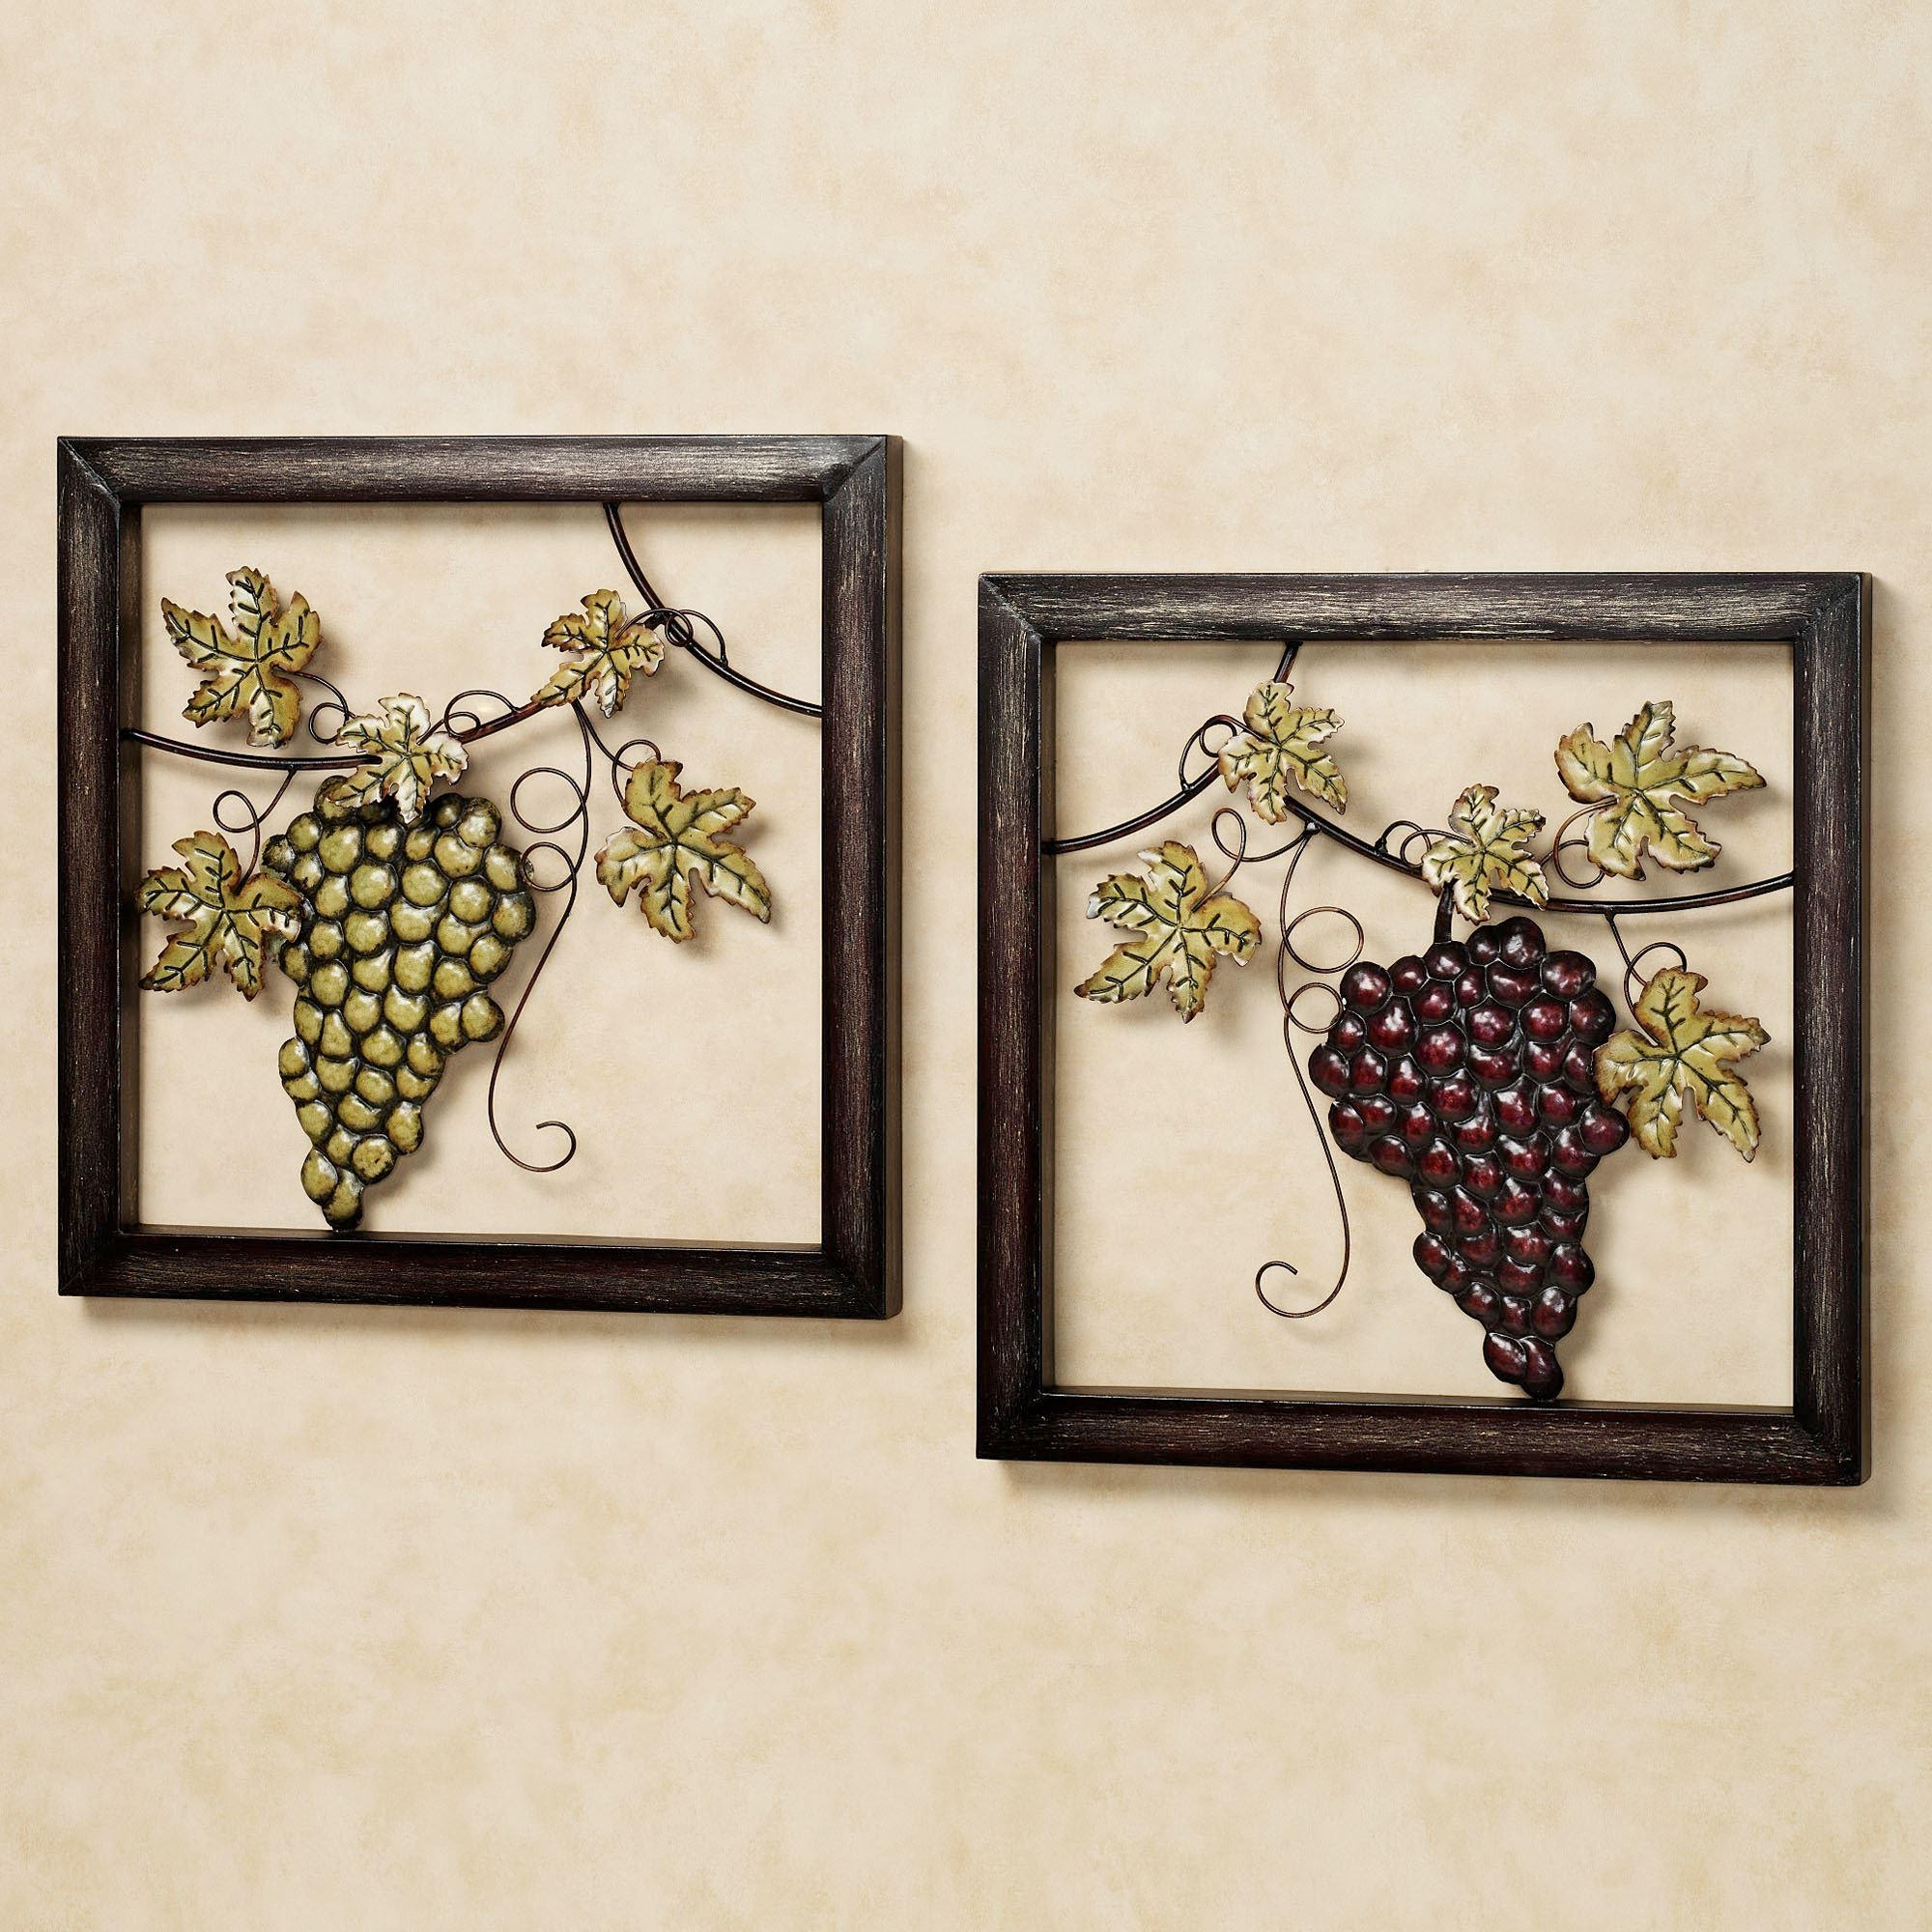 Zspmed Of Wine Wall Art Pertaining To Grape Wall Art (Photo 10 of 20)